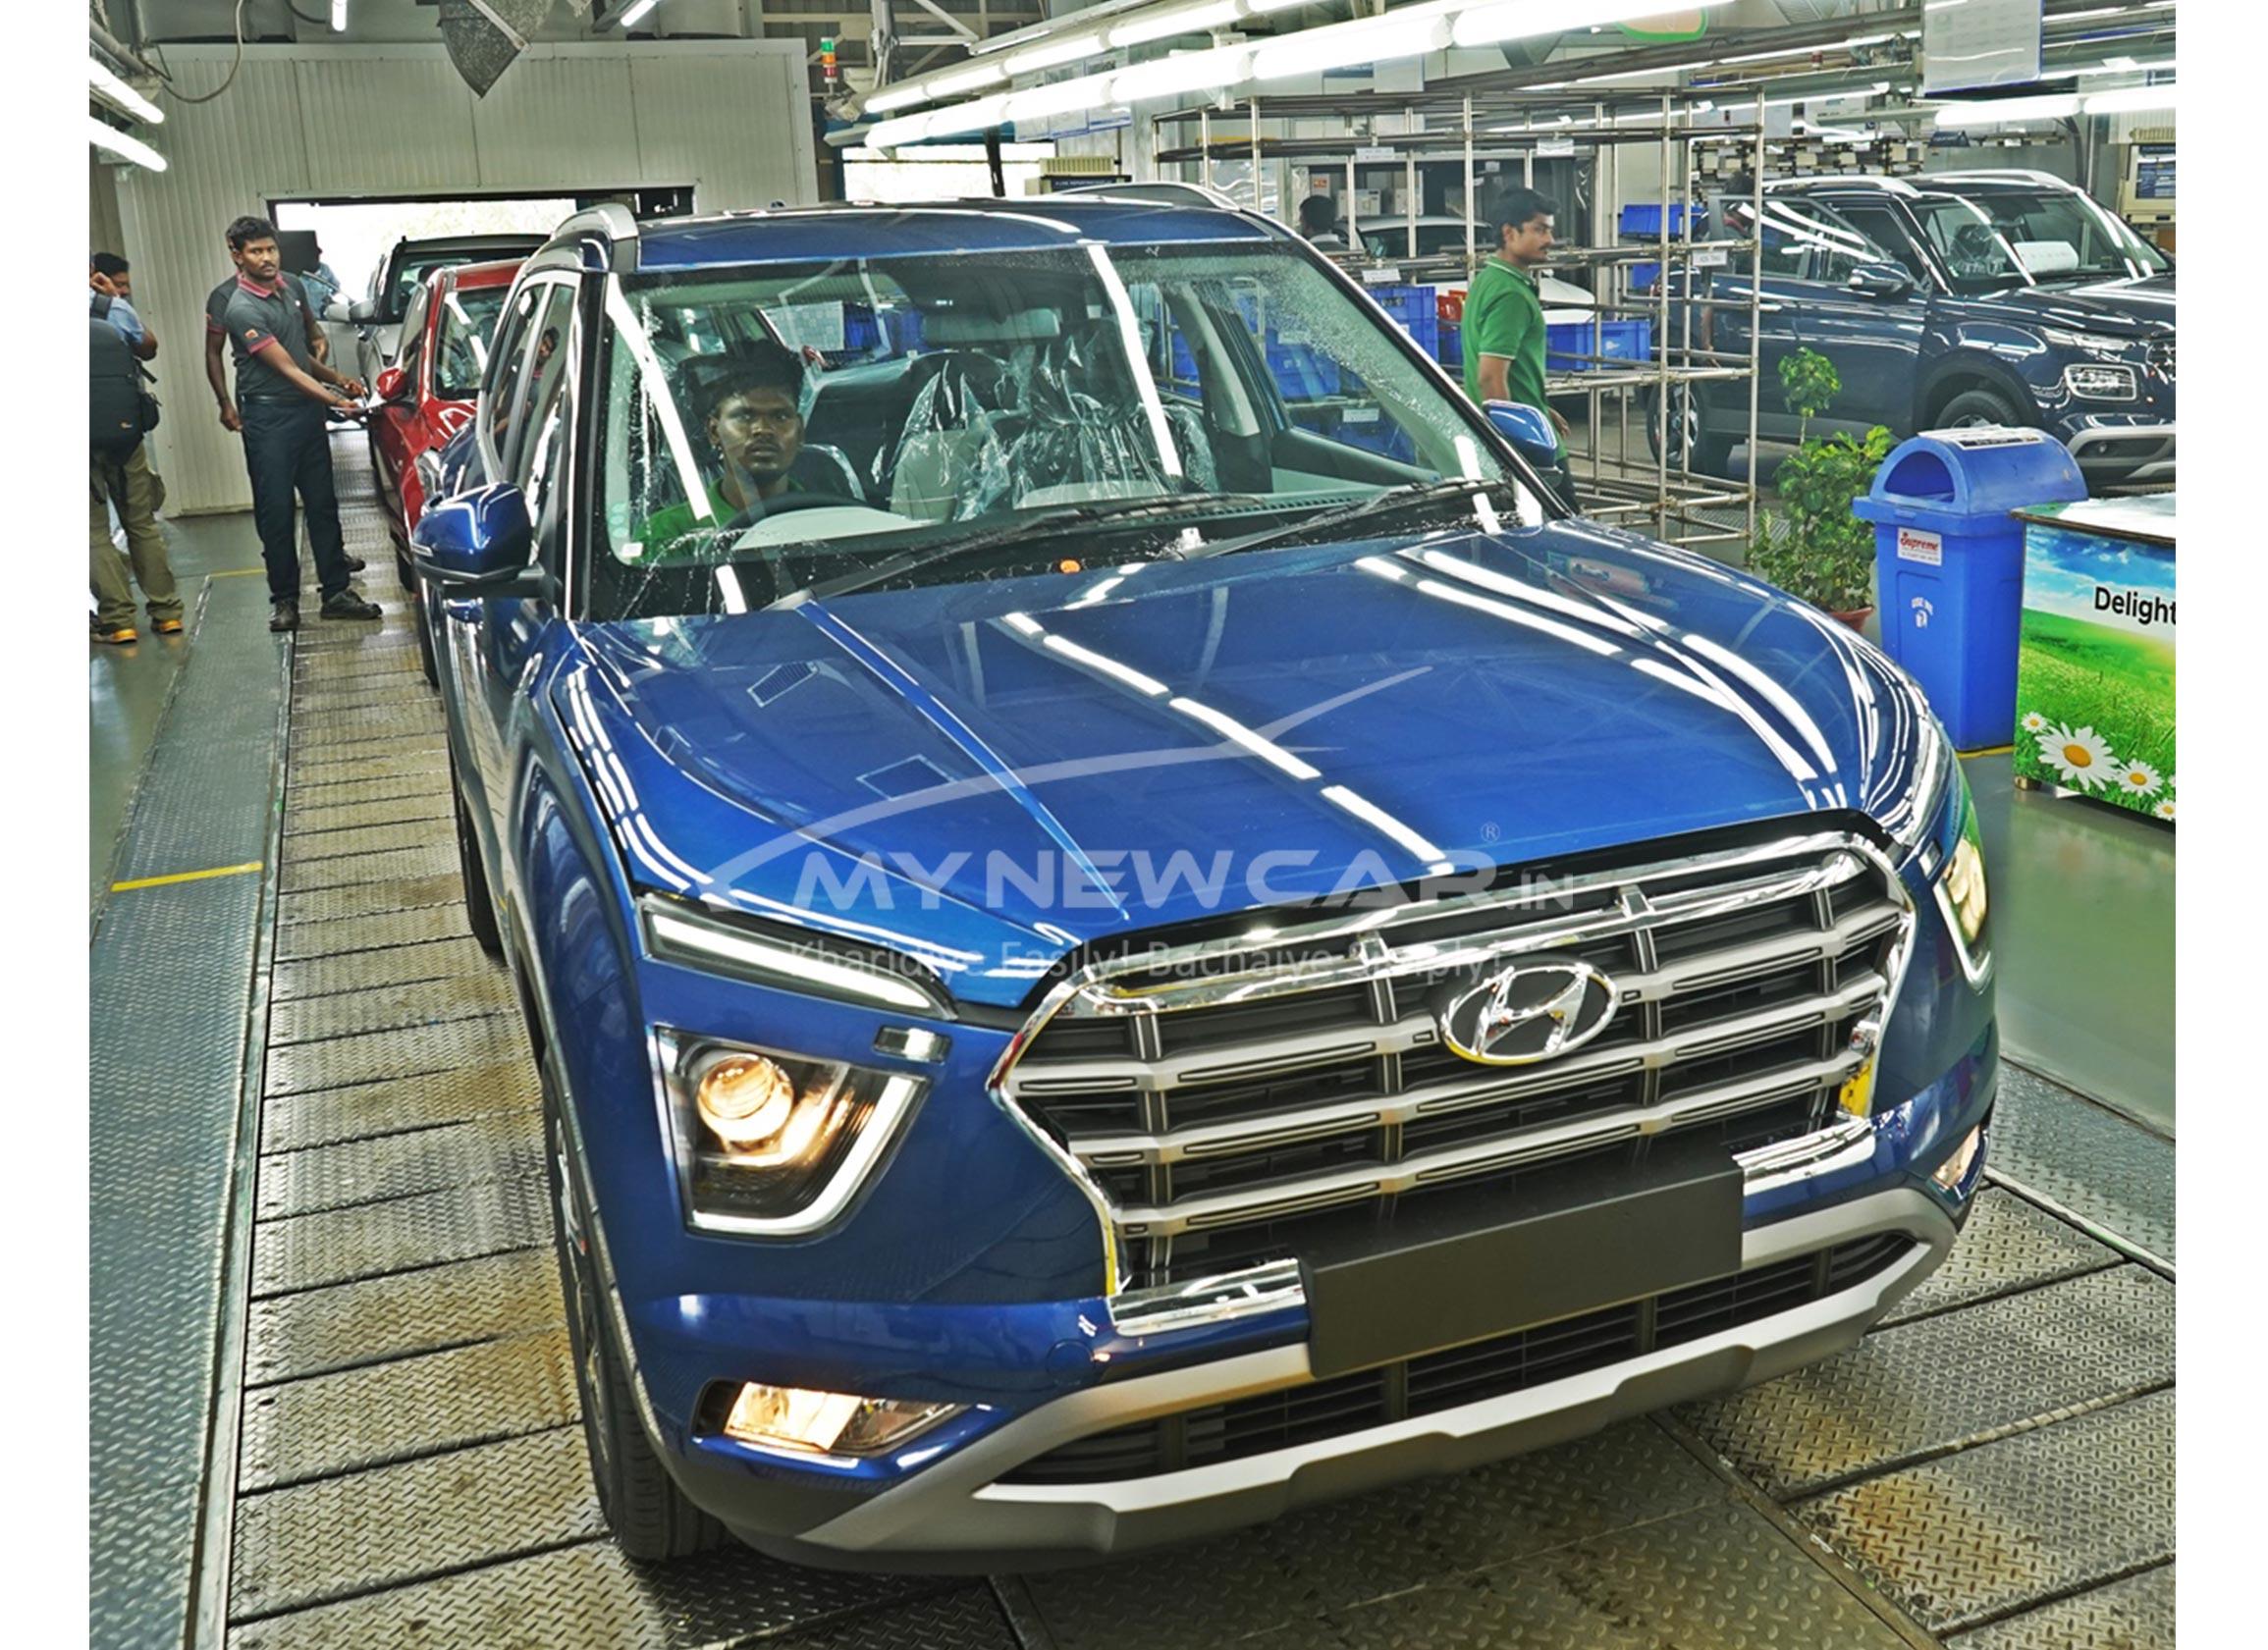 New Hyundai Creta image